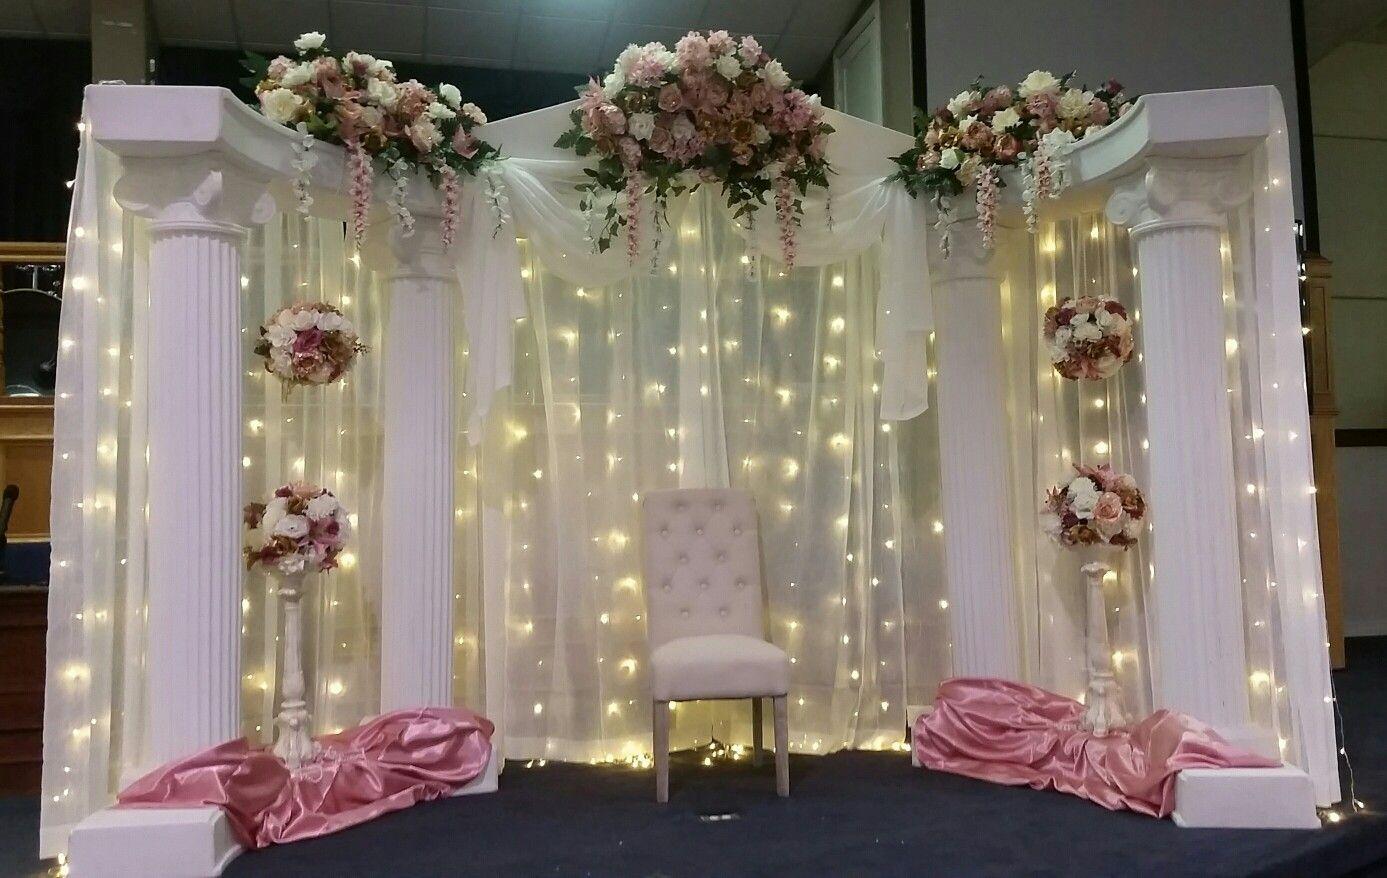 Backdrop White Columns With Lights Flower Balls Wedding Backdrop Wedding Decorations Decor